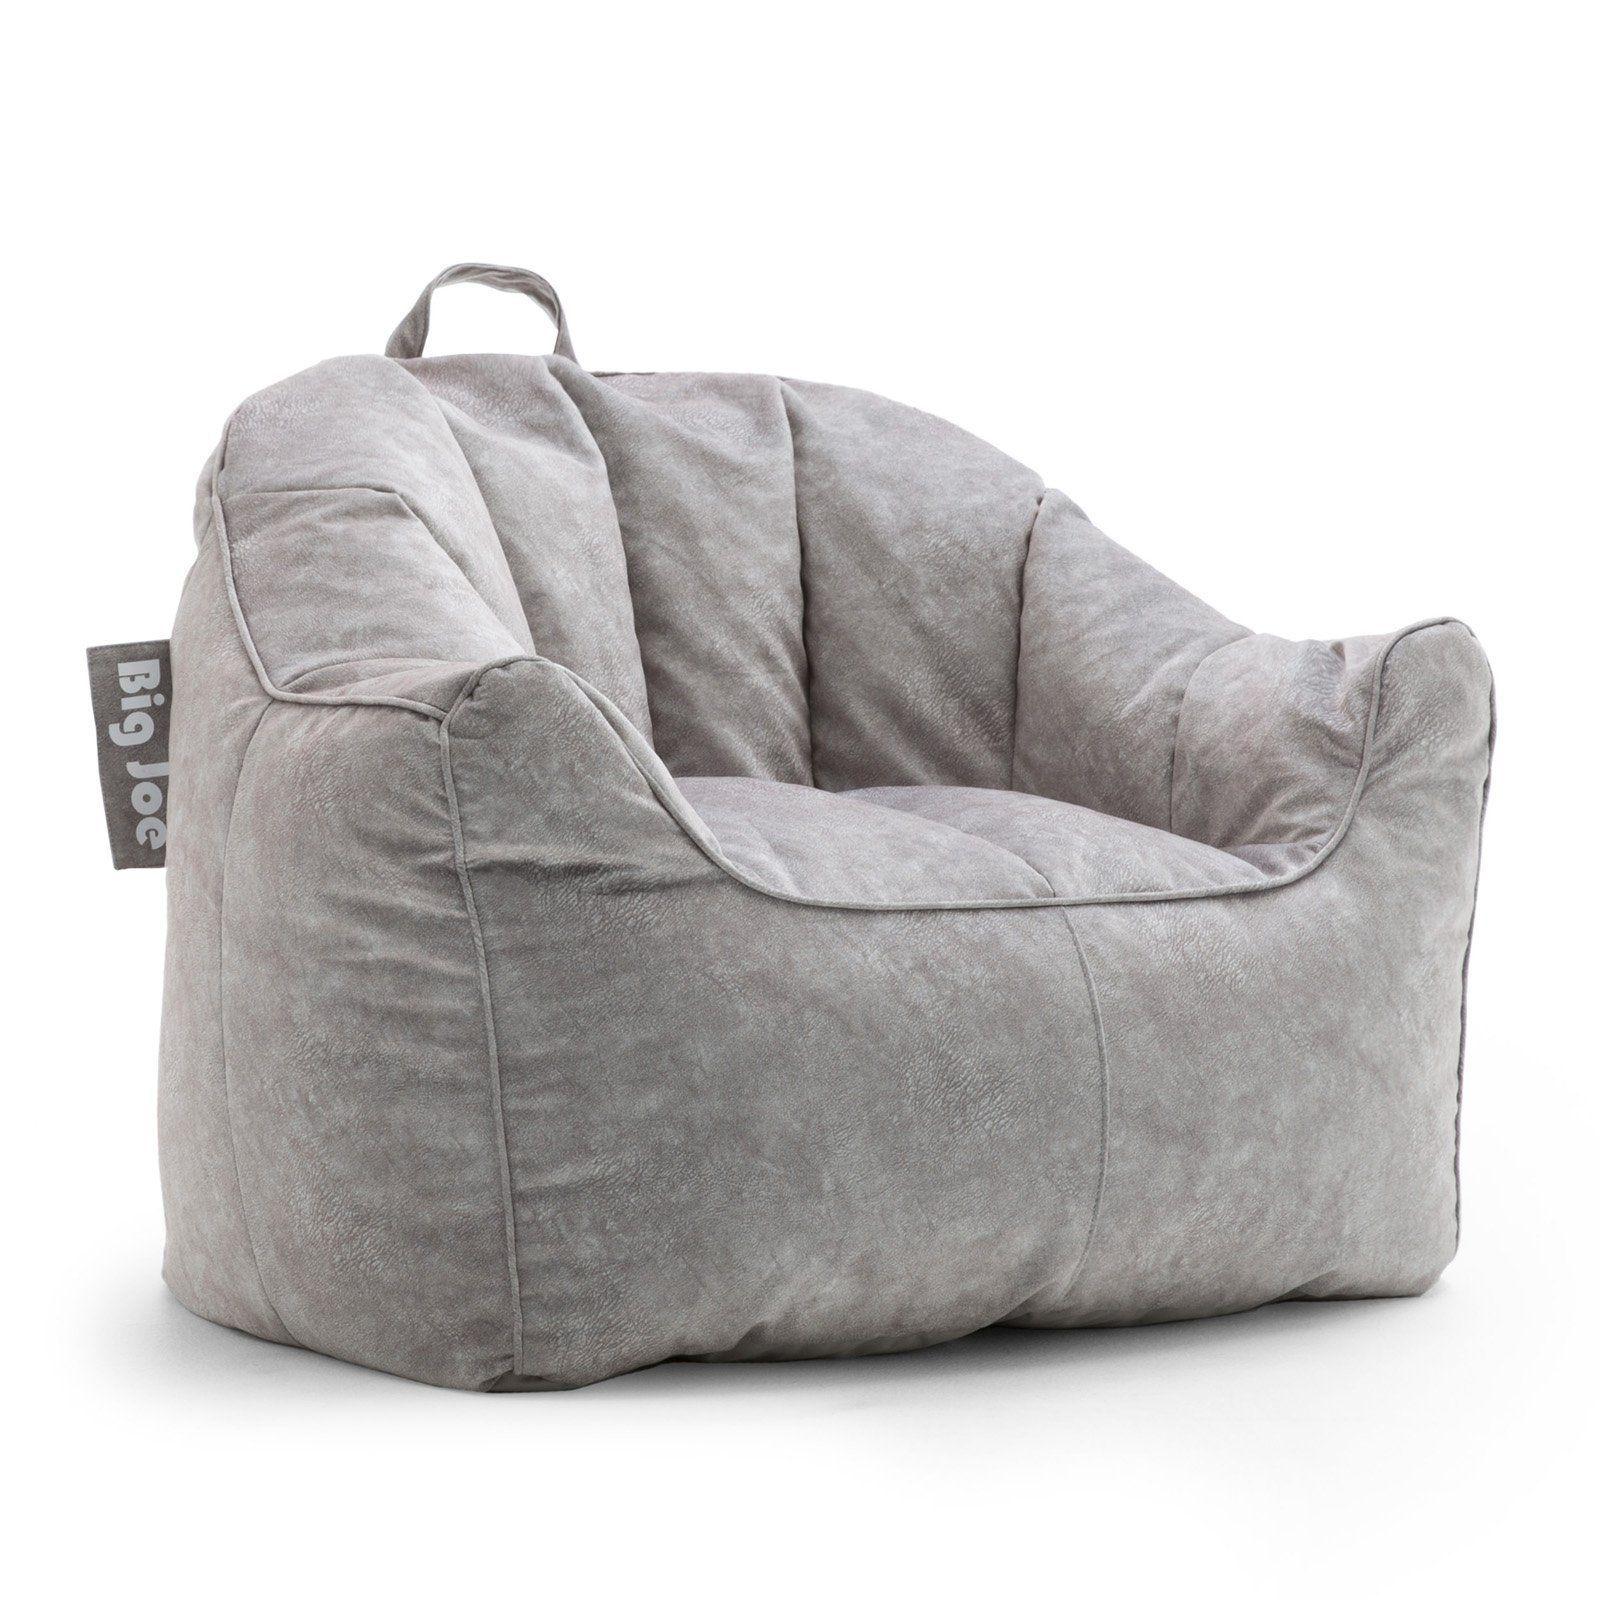 Reading Corner Discover Big Joe Hug Bean Bag Chair Lunar Gray Dimensions 34l X 28w X 28h In Pea Sized Recycl In 2020 Bean Bag Chair Comfy Chairs Bean Bag Chair Kids